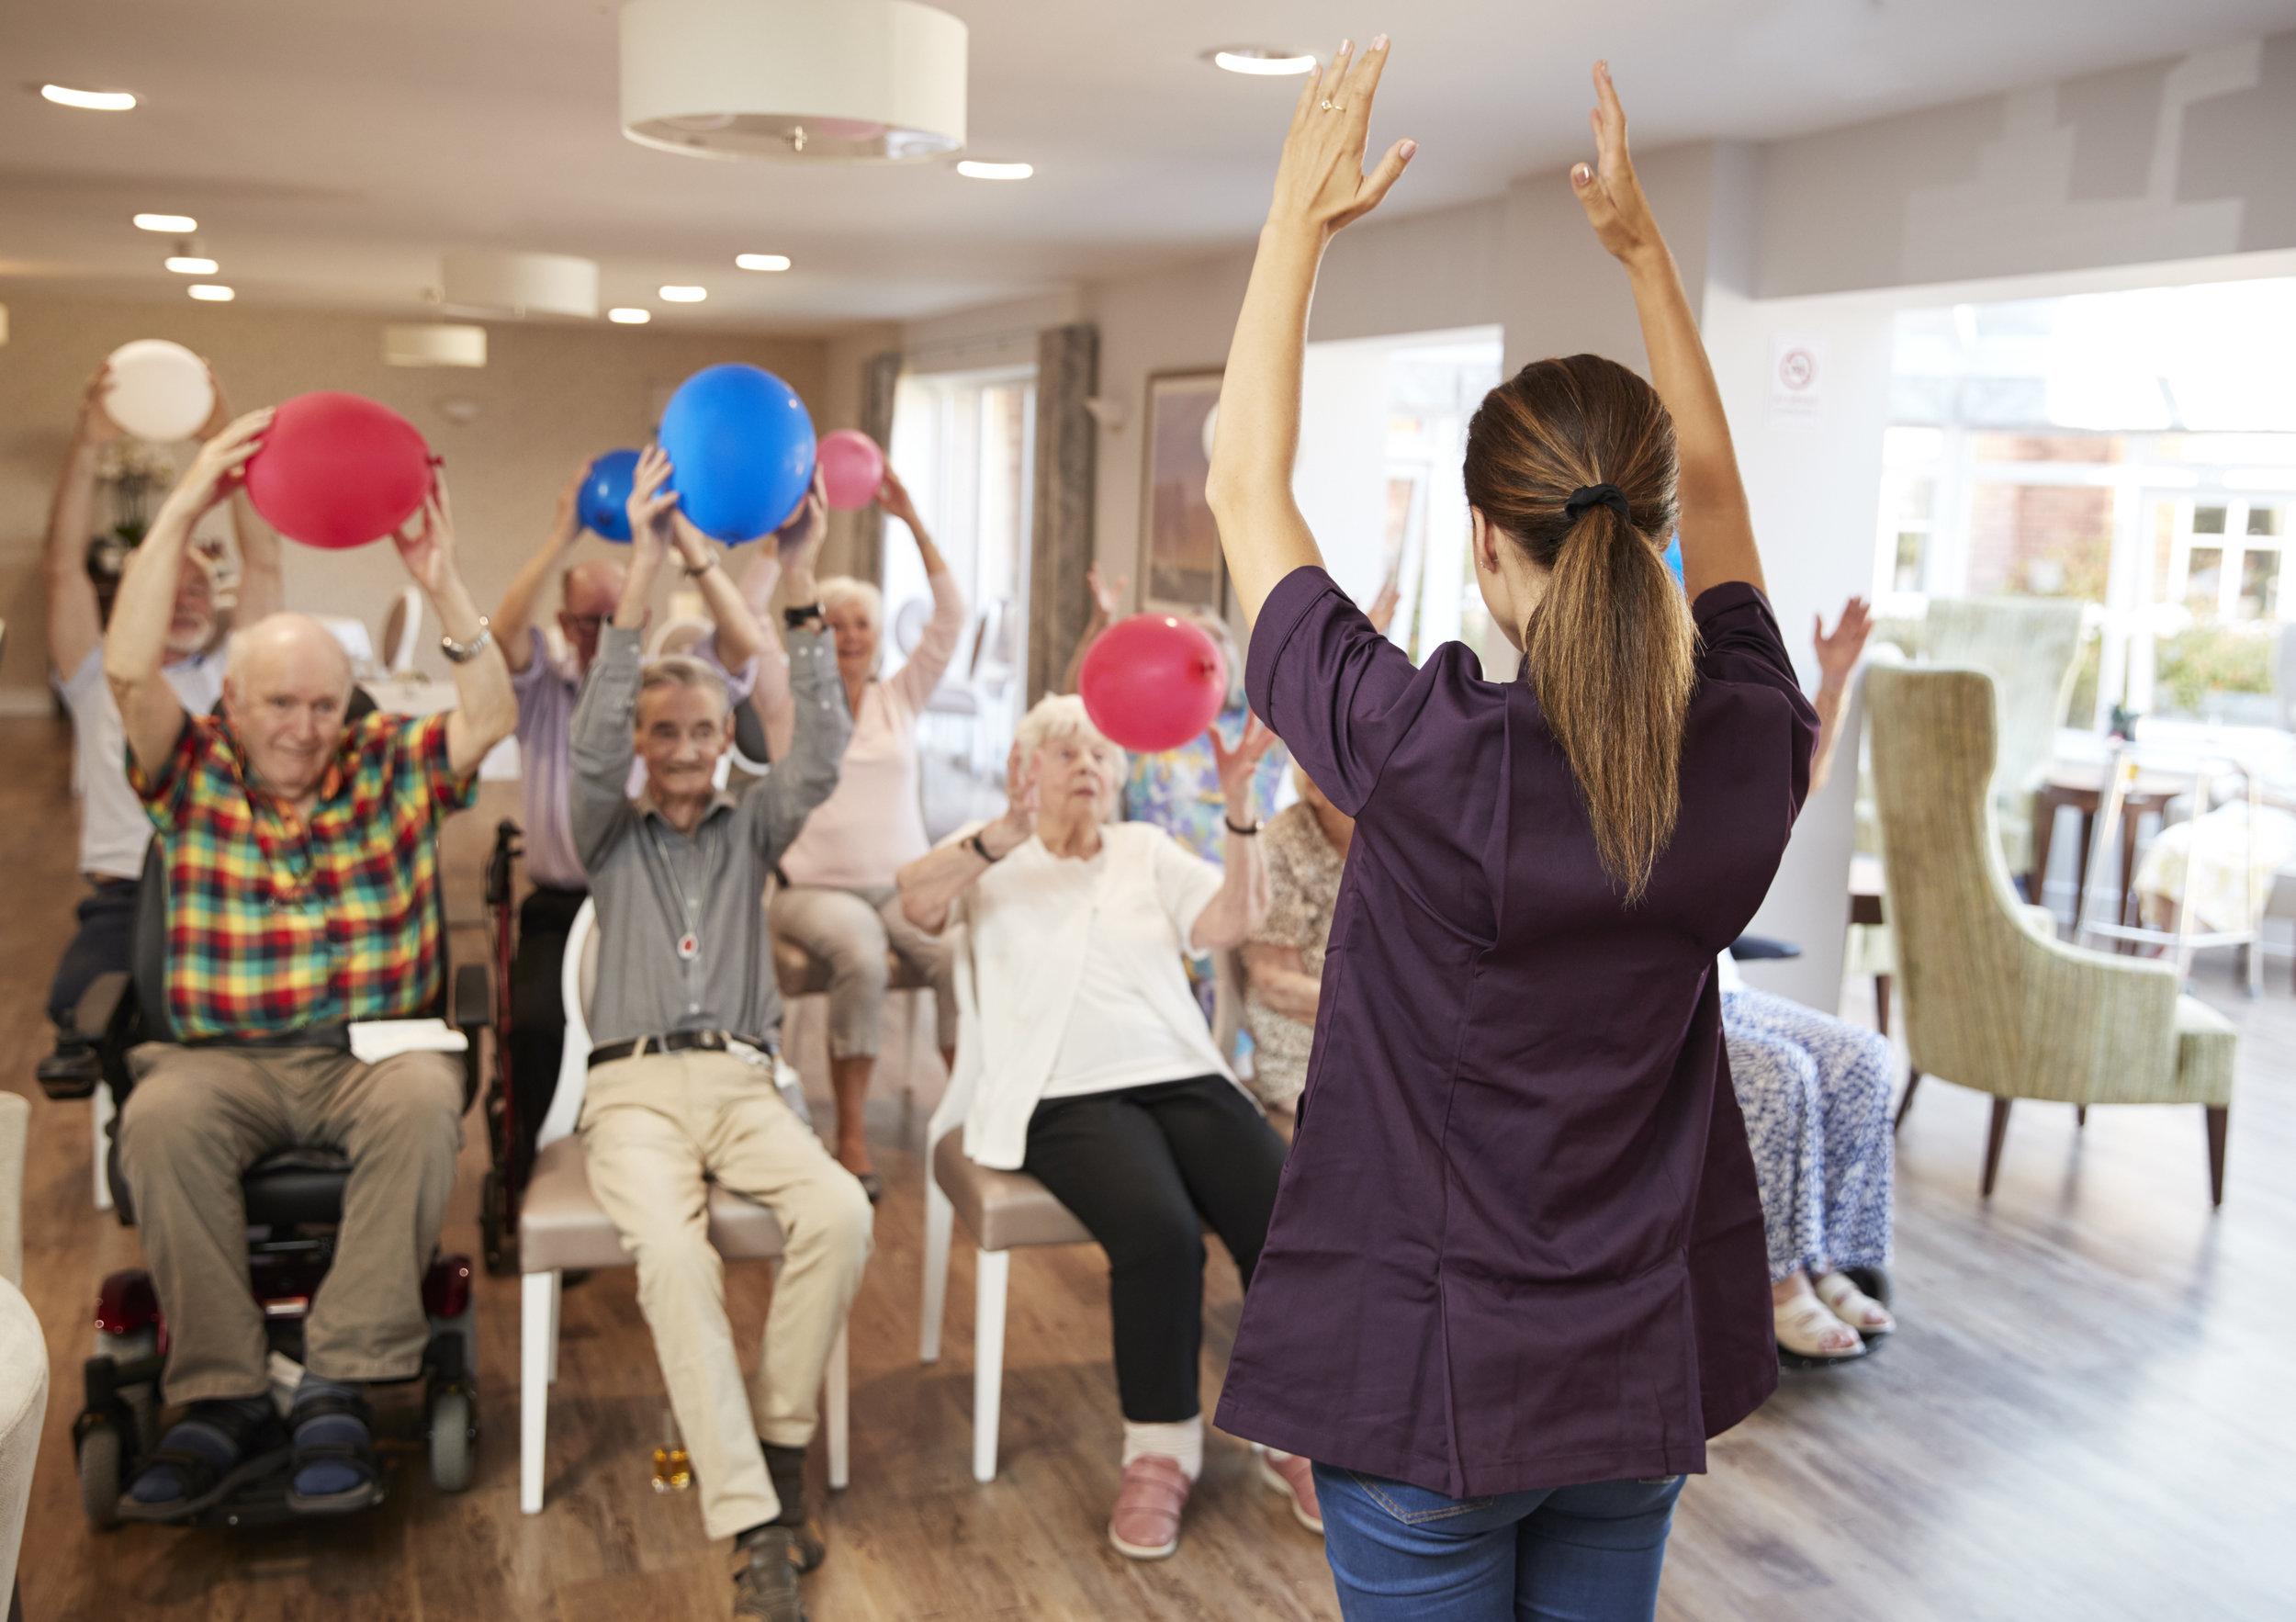 Seniors exercise class